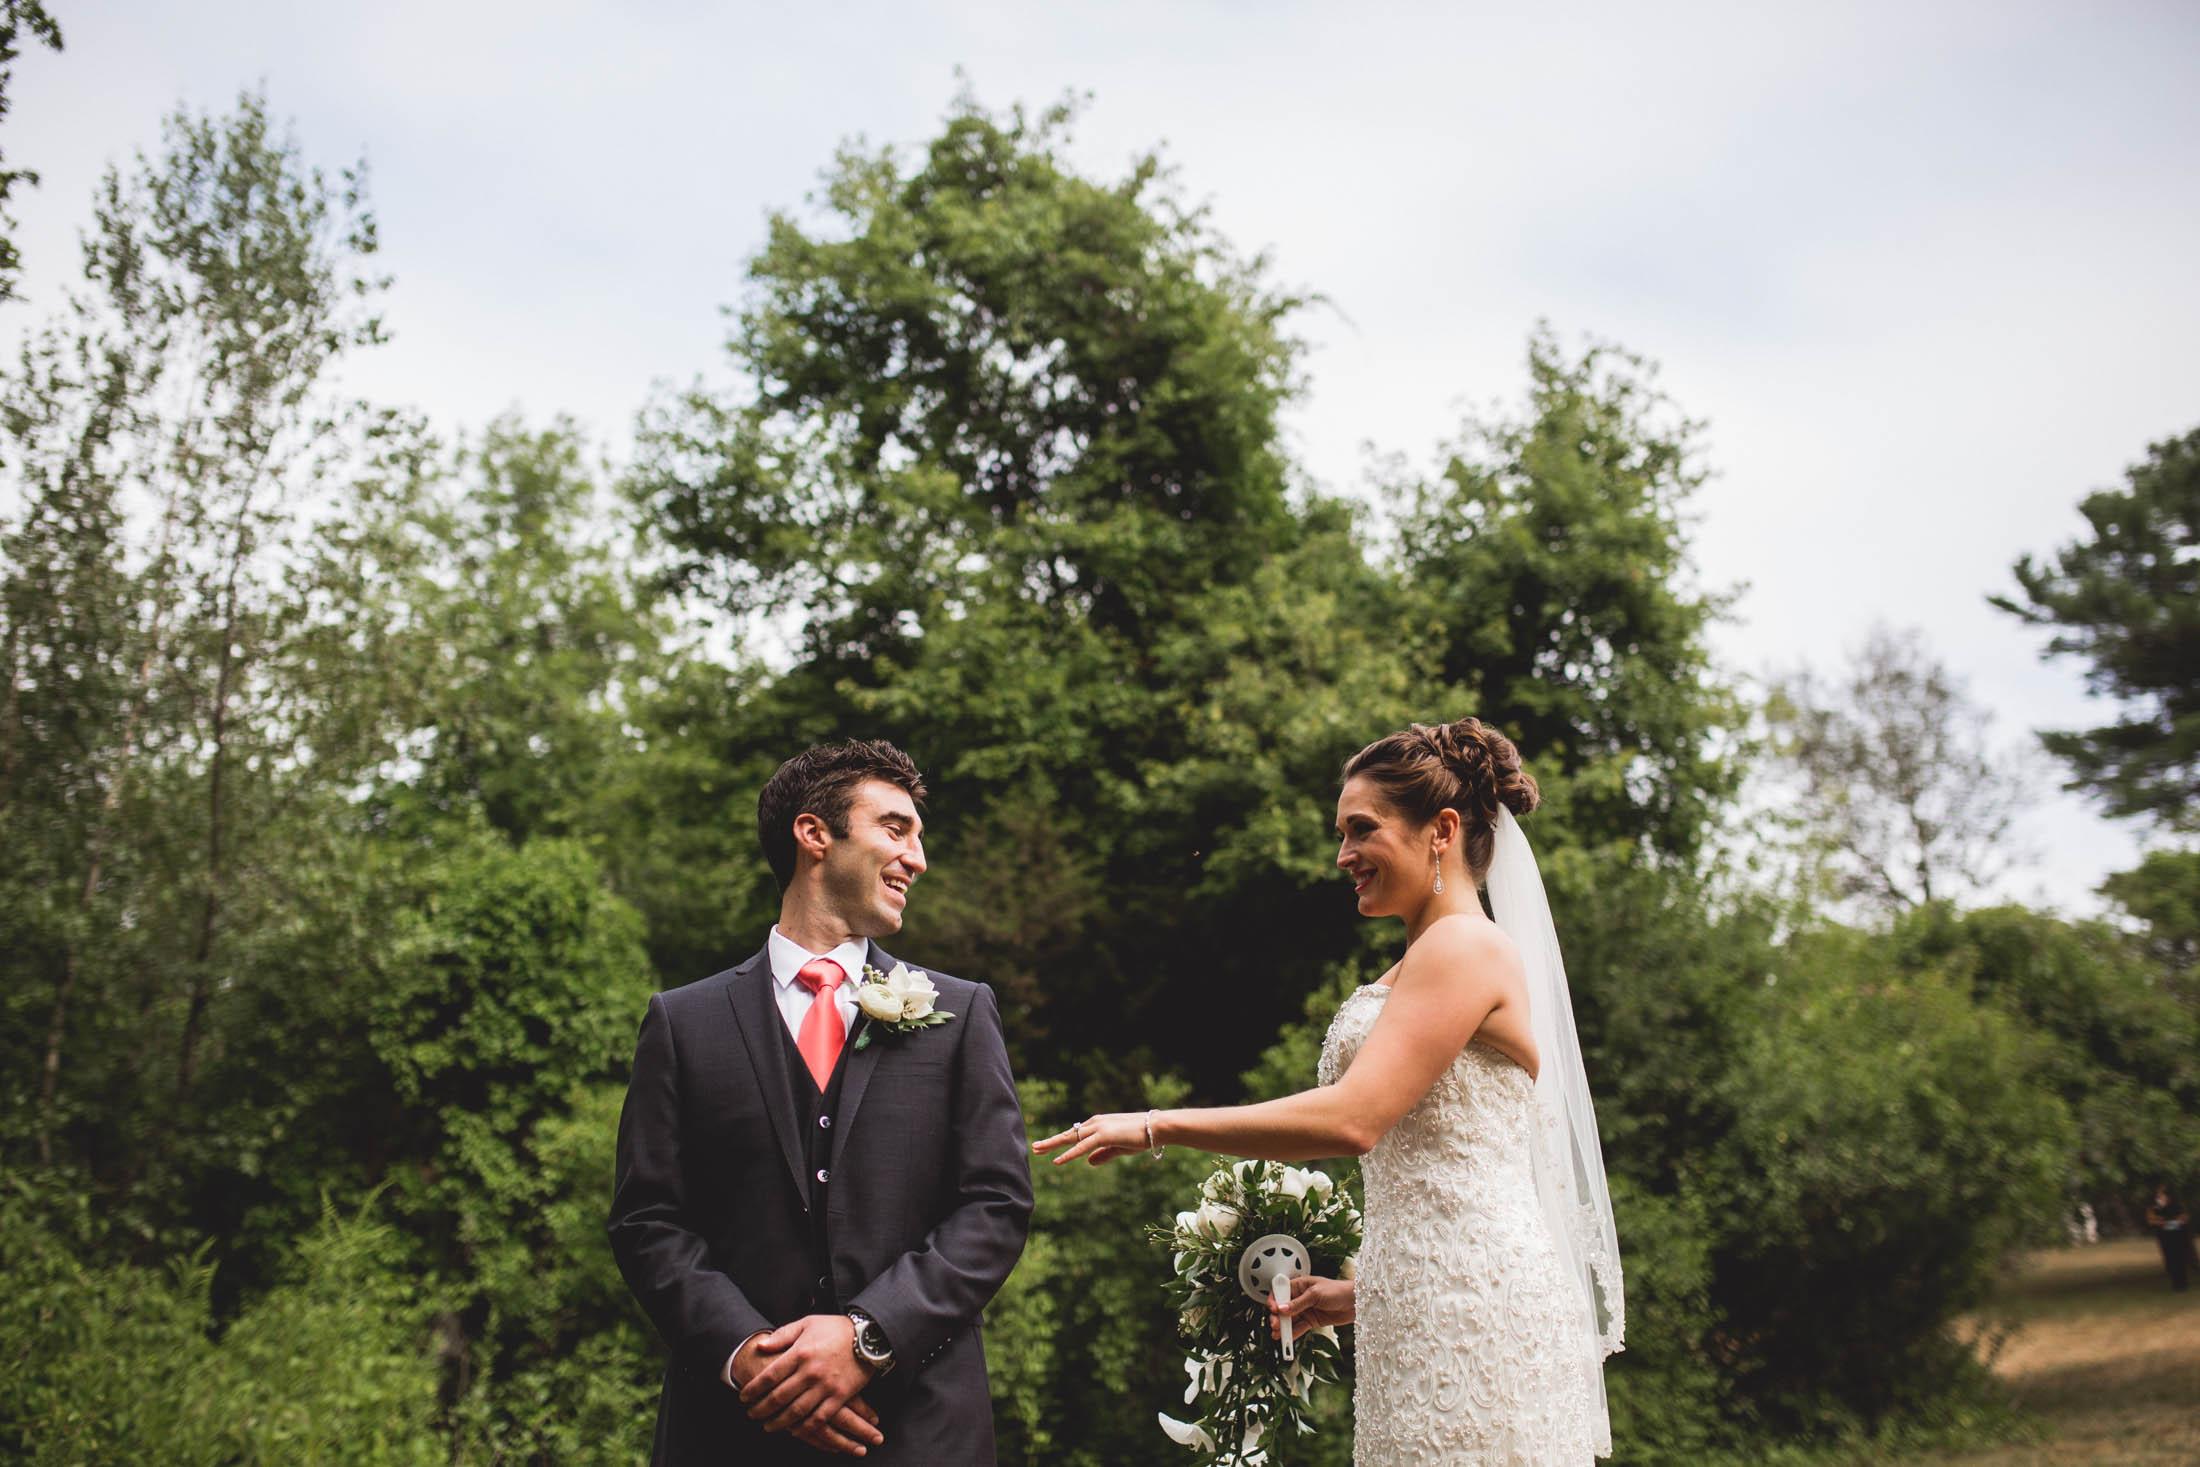 Willowdale-wedding-photography-9.jpg